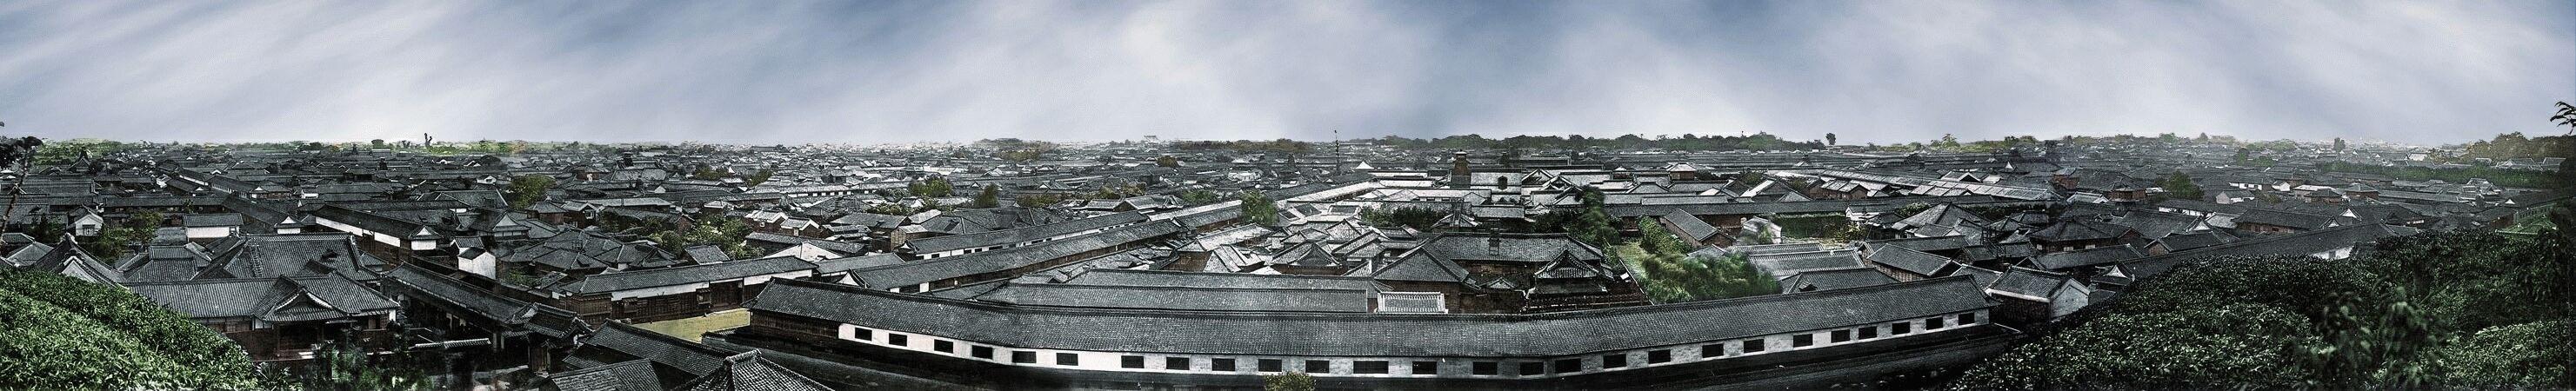 edo 江戸の町並み